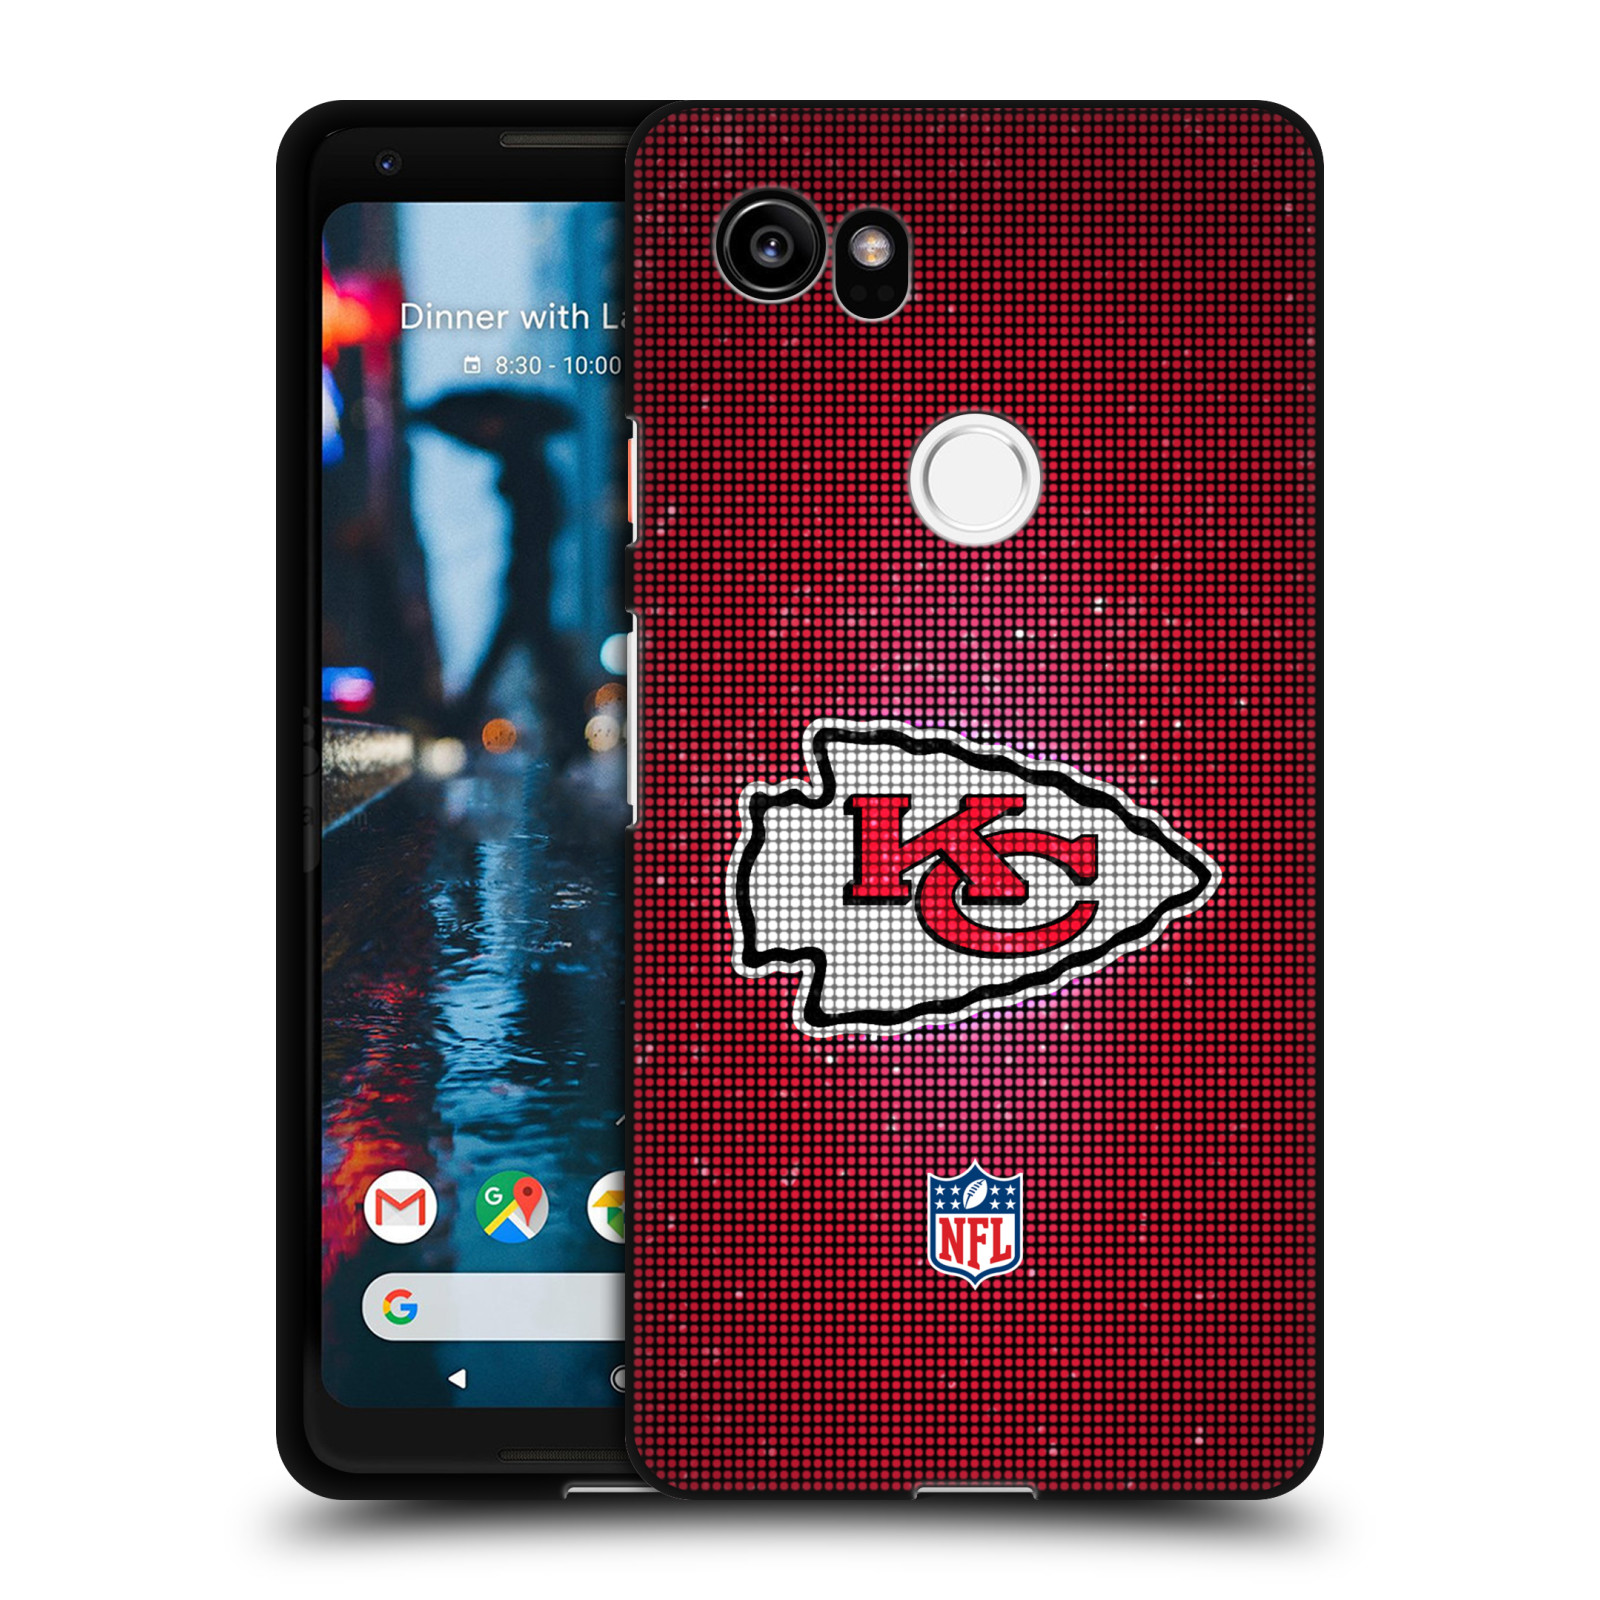 UFFICIALE-NFL-2017-18-KANSAS-CITY-CHIEFS-COVER-IN-GEL-NERA-PER-GOOGLE-TELEFONI